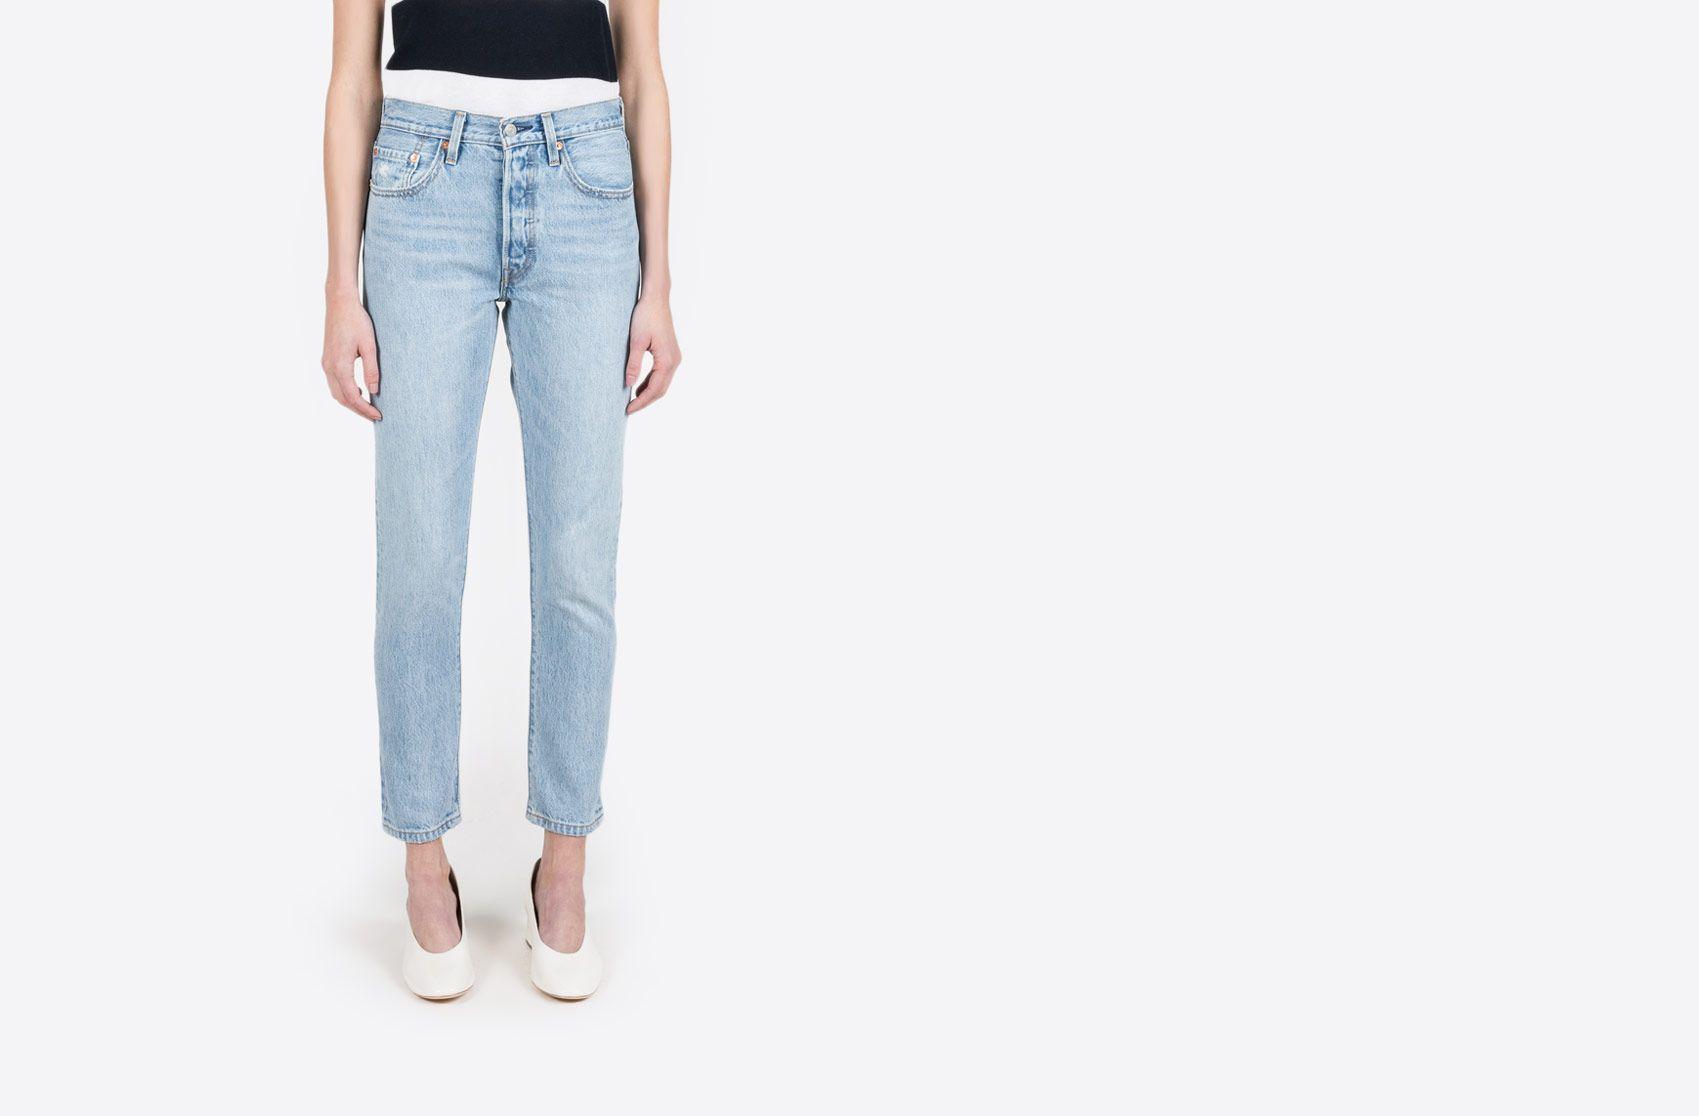 Levi's 501 Skinny Lovefool Jean